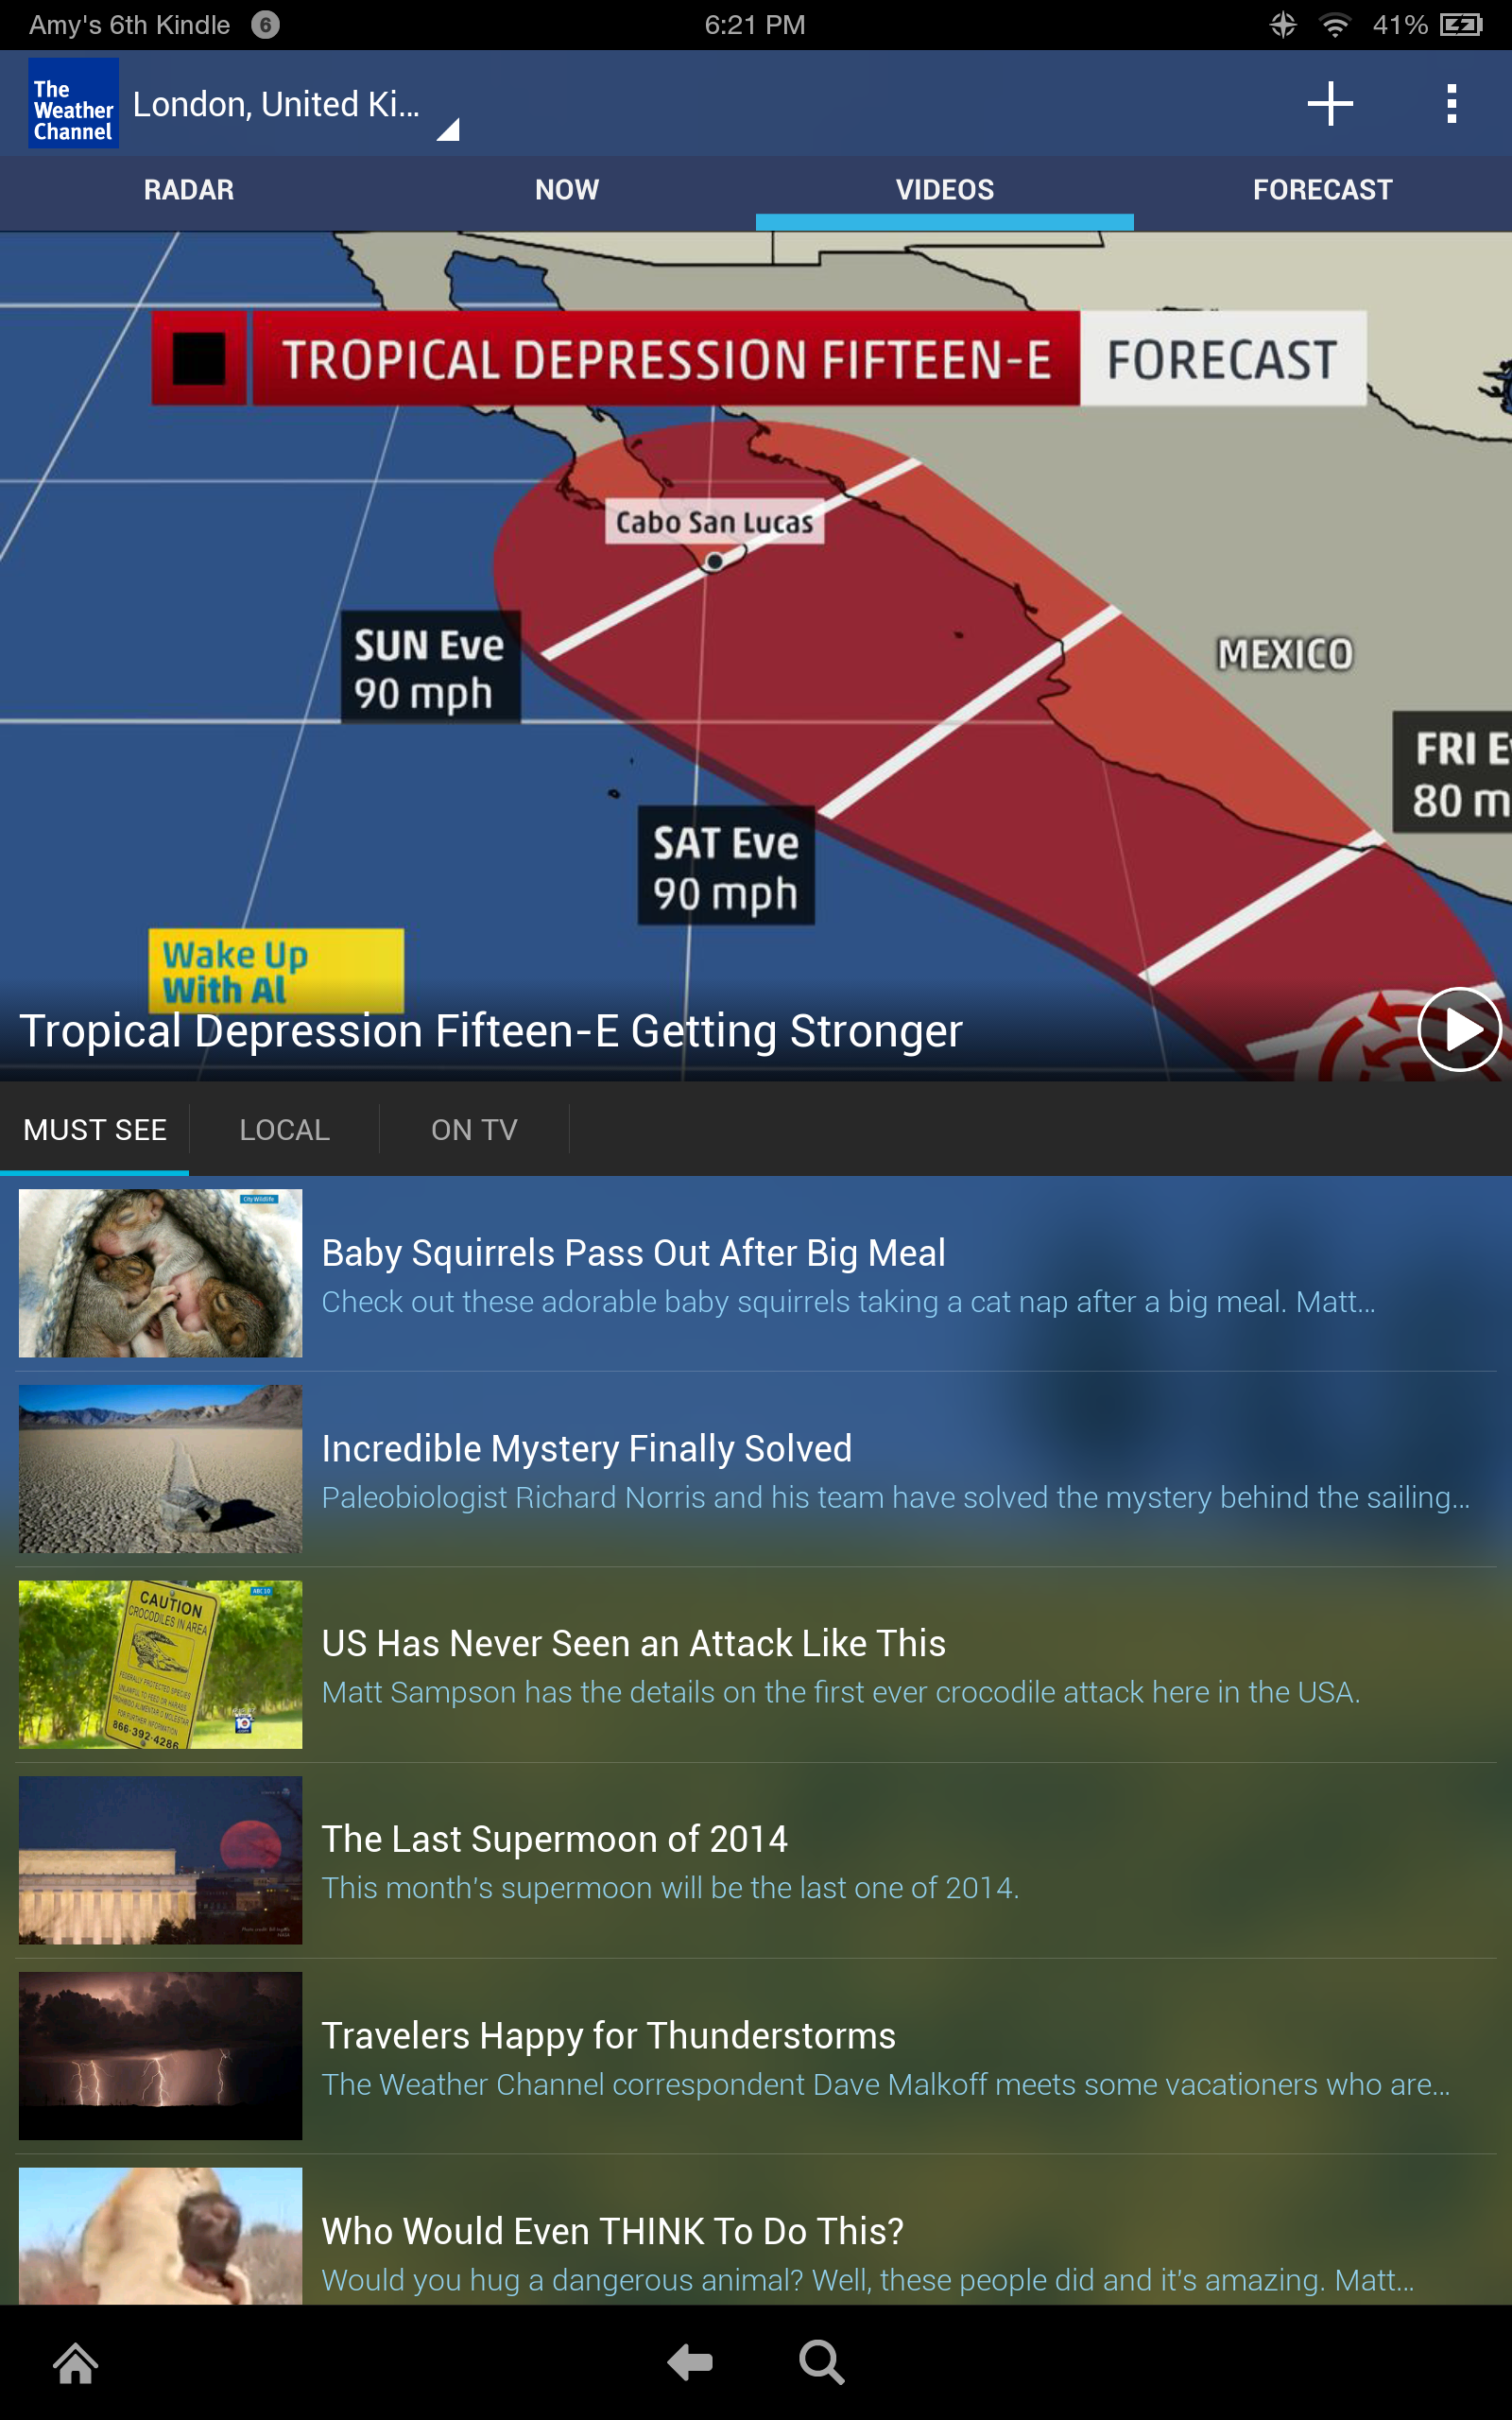 amazon com  the weather channel  forecast  radar  u0026 alerts